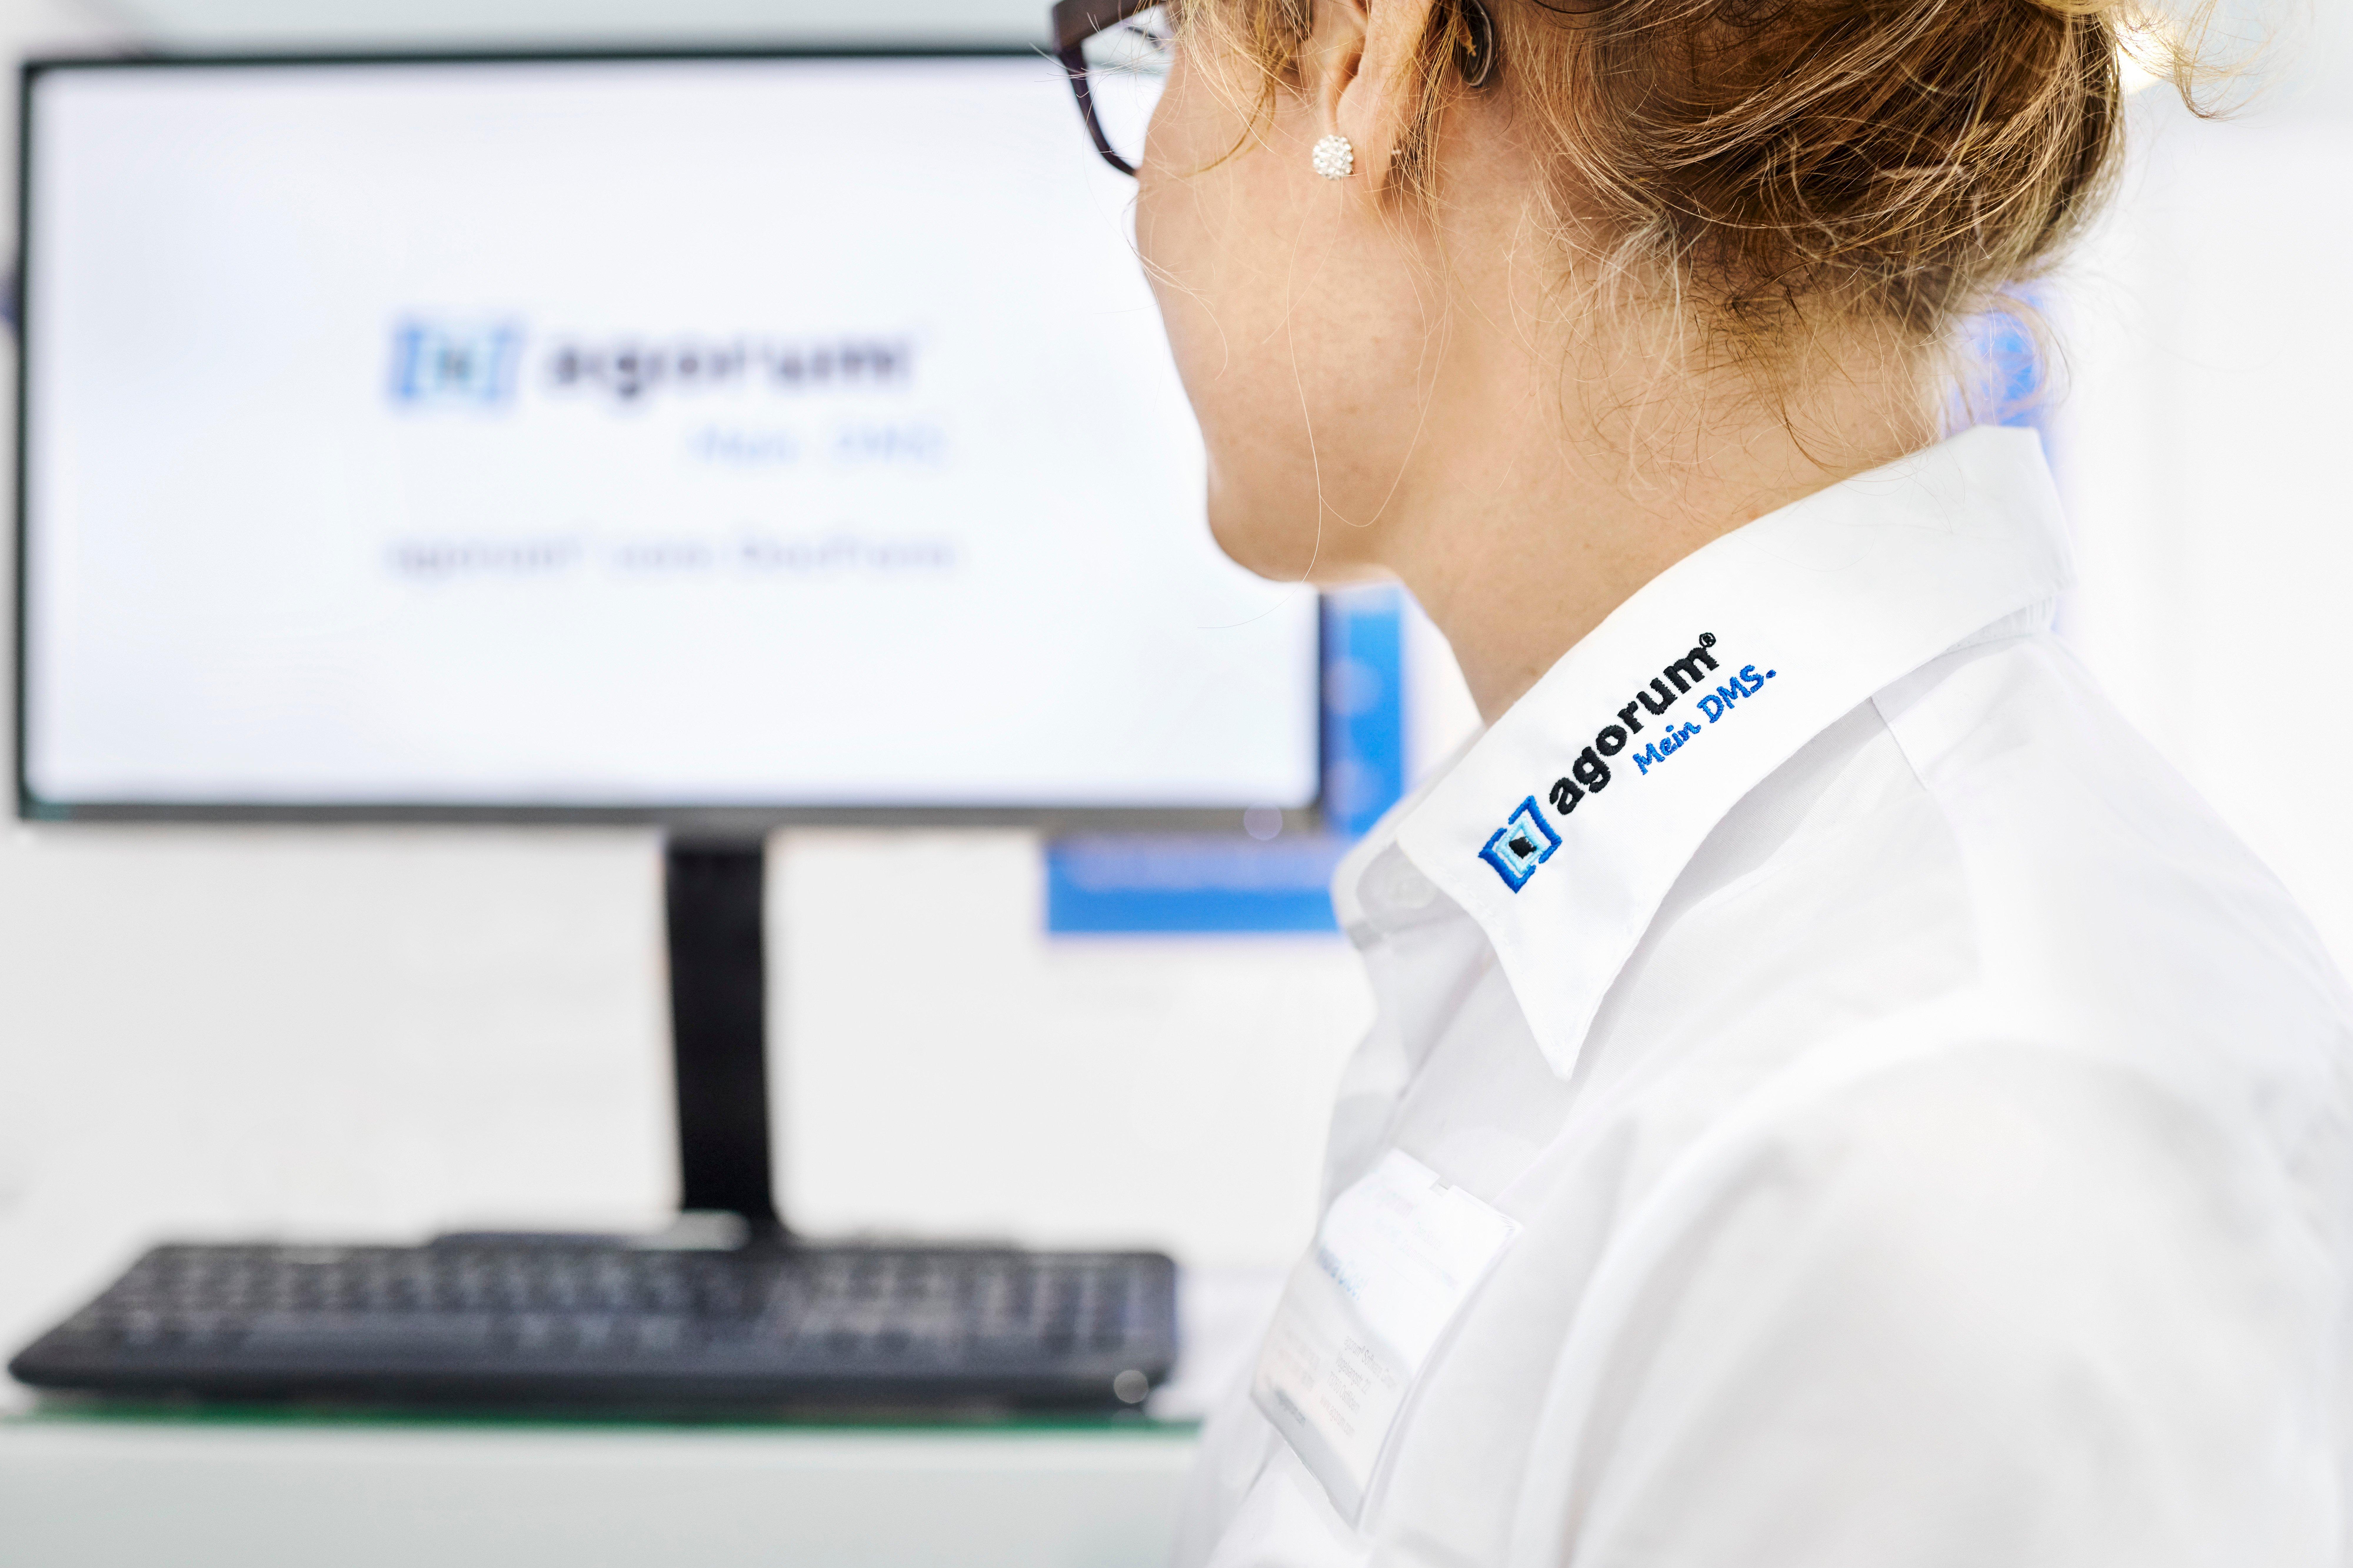 agorum Digitalisierung 4.0 Digital Workplace